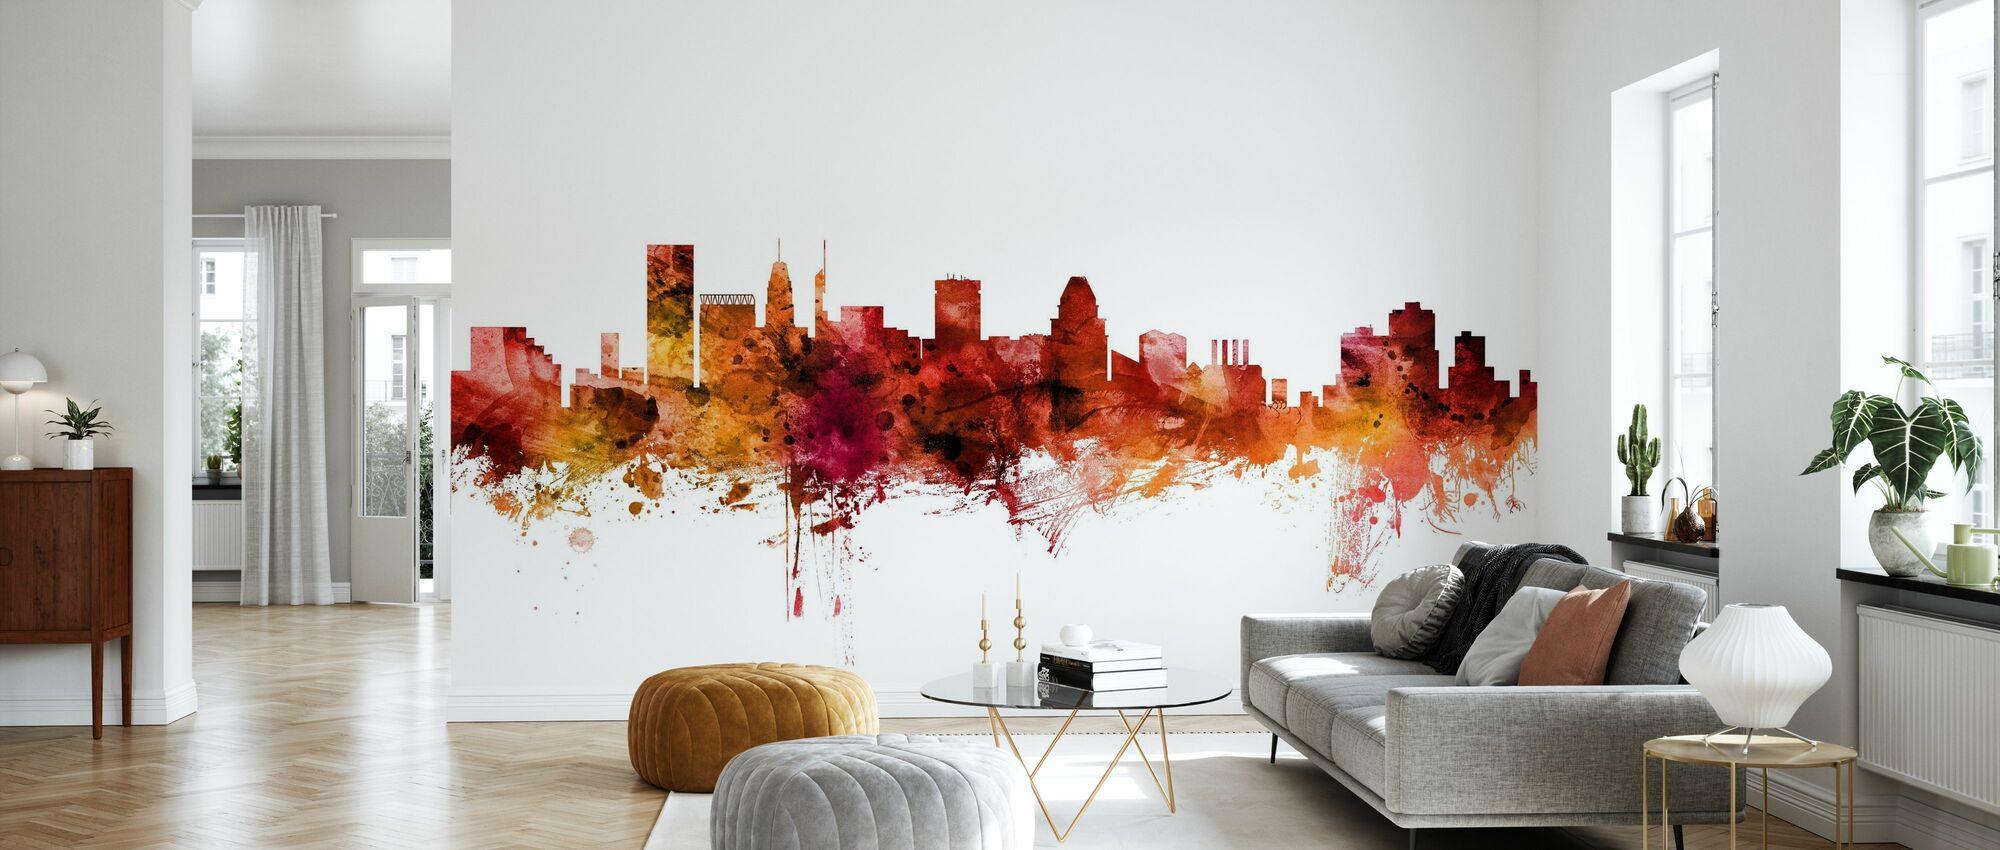 Baltimore Maryland Skyline - Wallpaper - Living Room